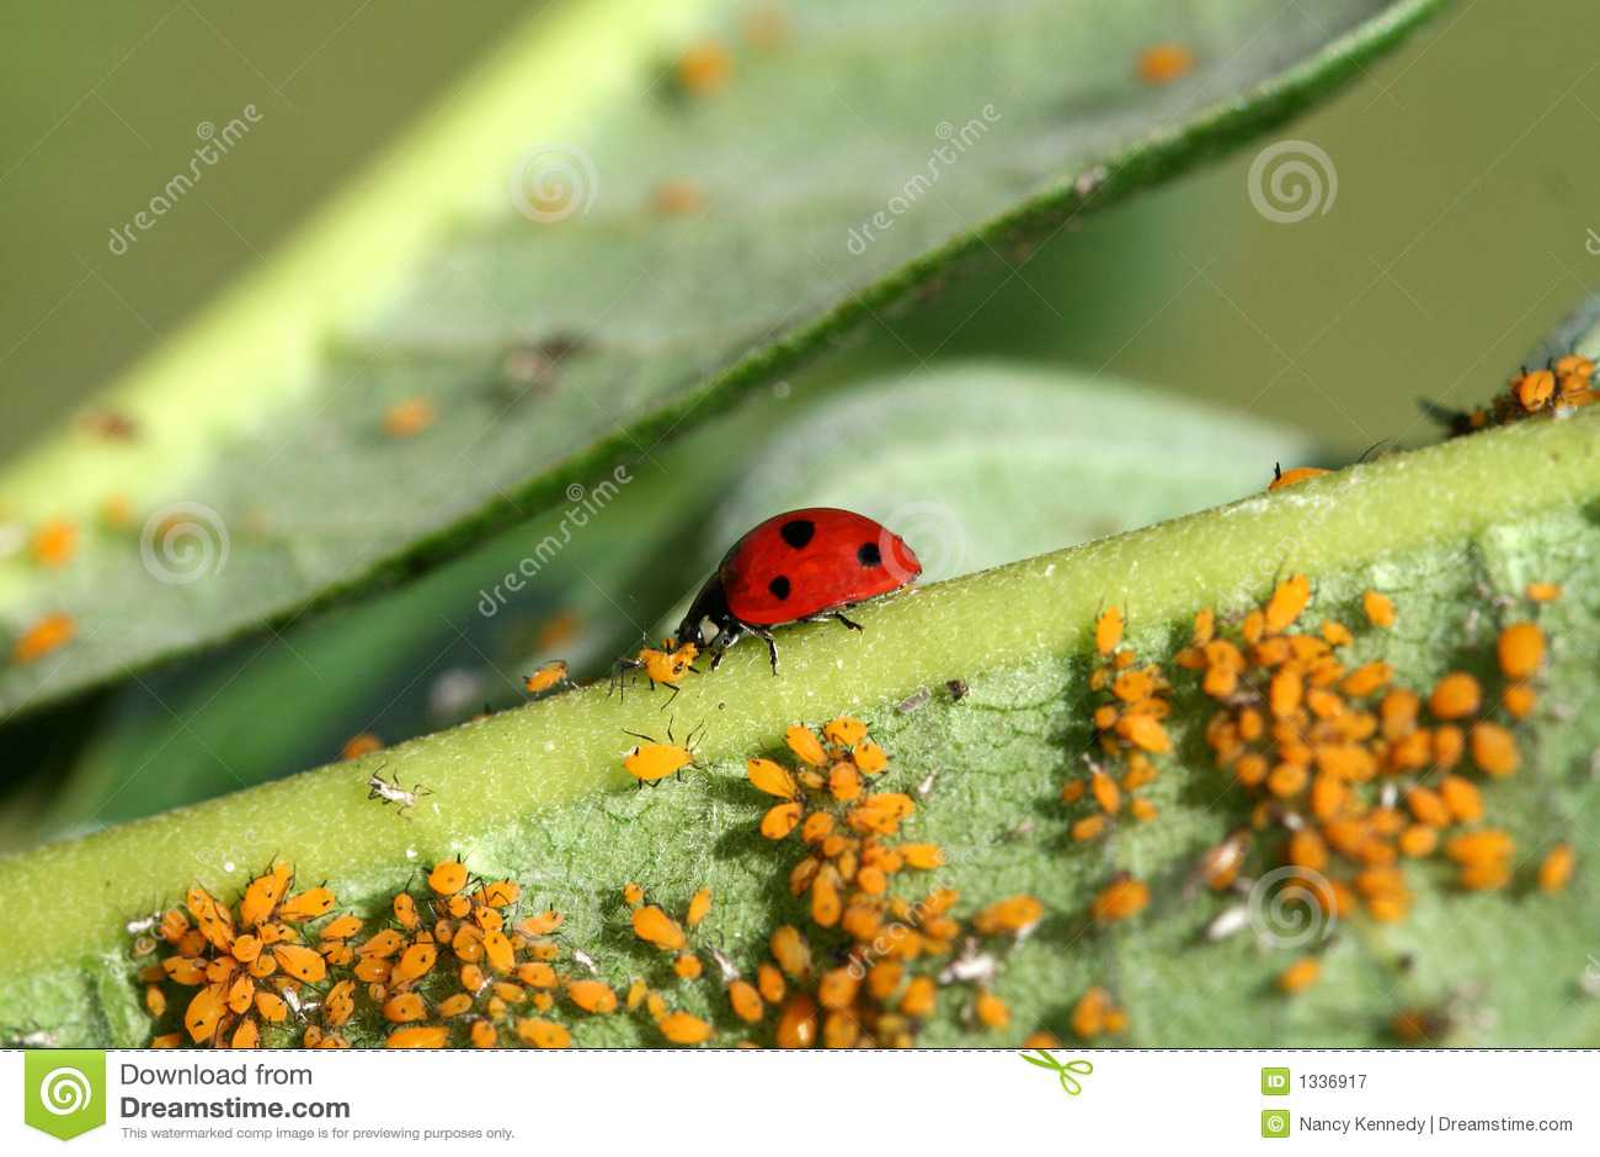 Ladybug Feast Stock Image Image Of Predaceous Harmless 1336917